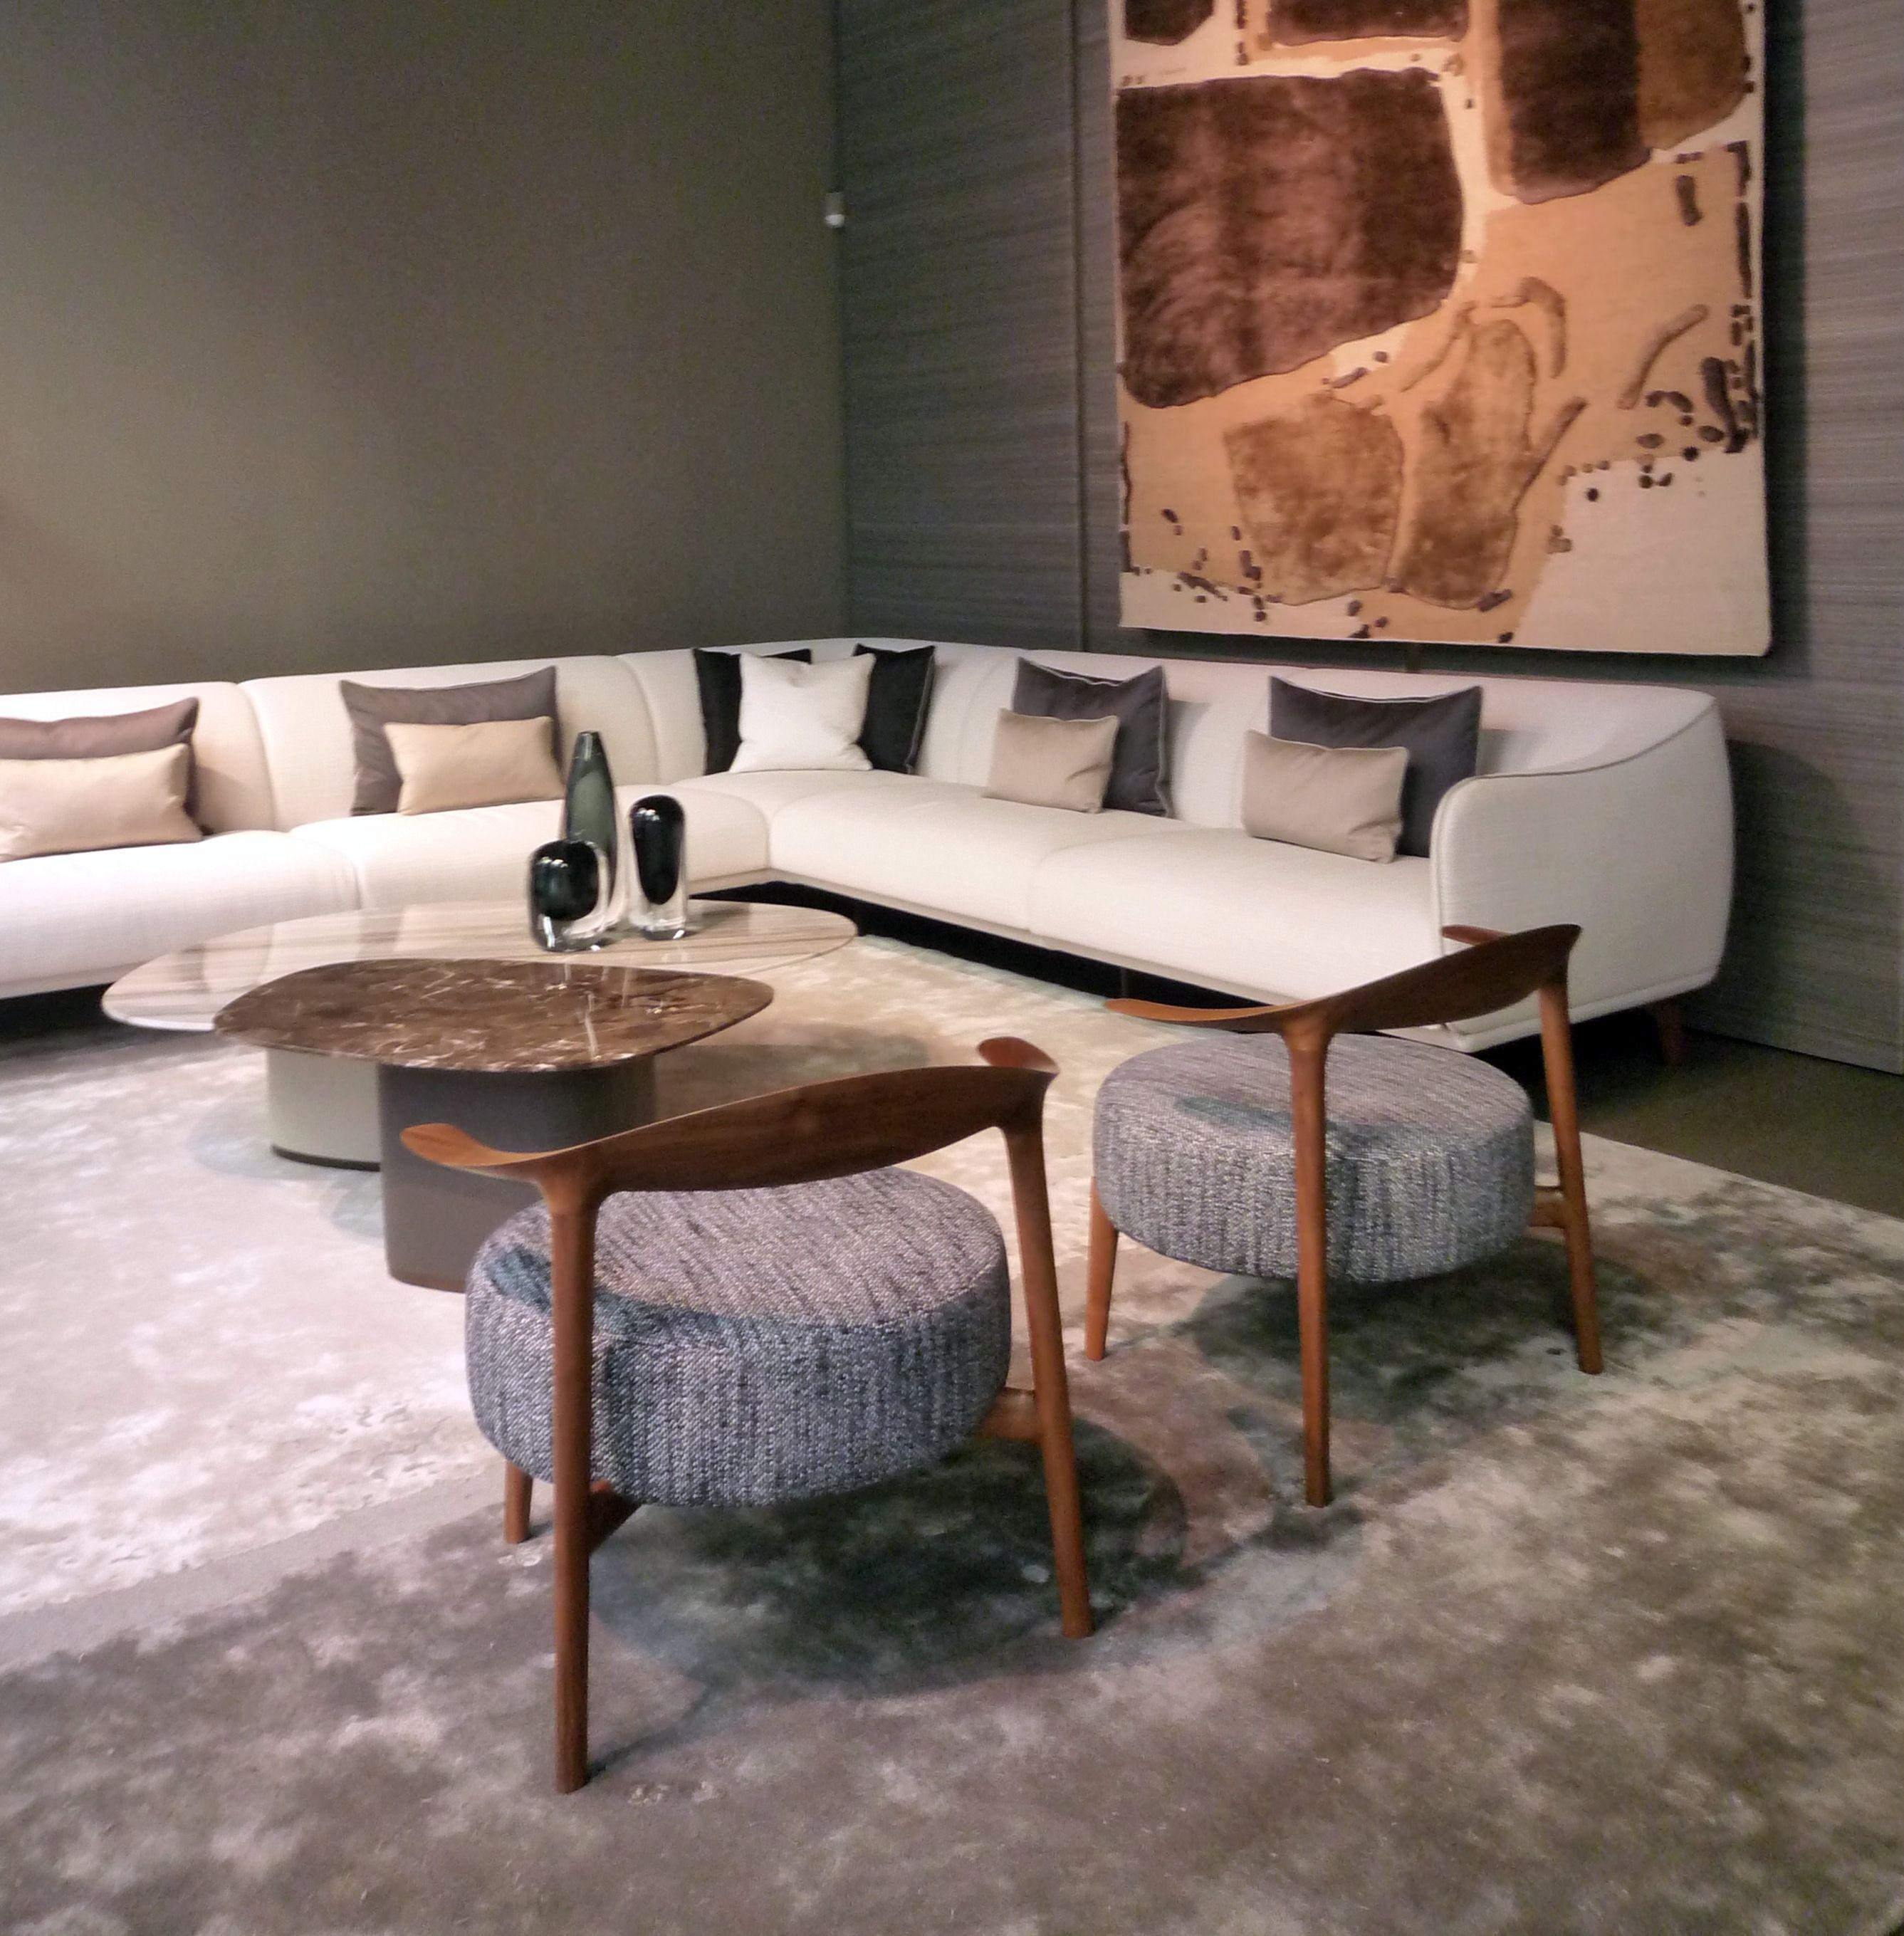 Ripple Galet Italian furniture brands